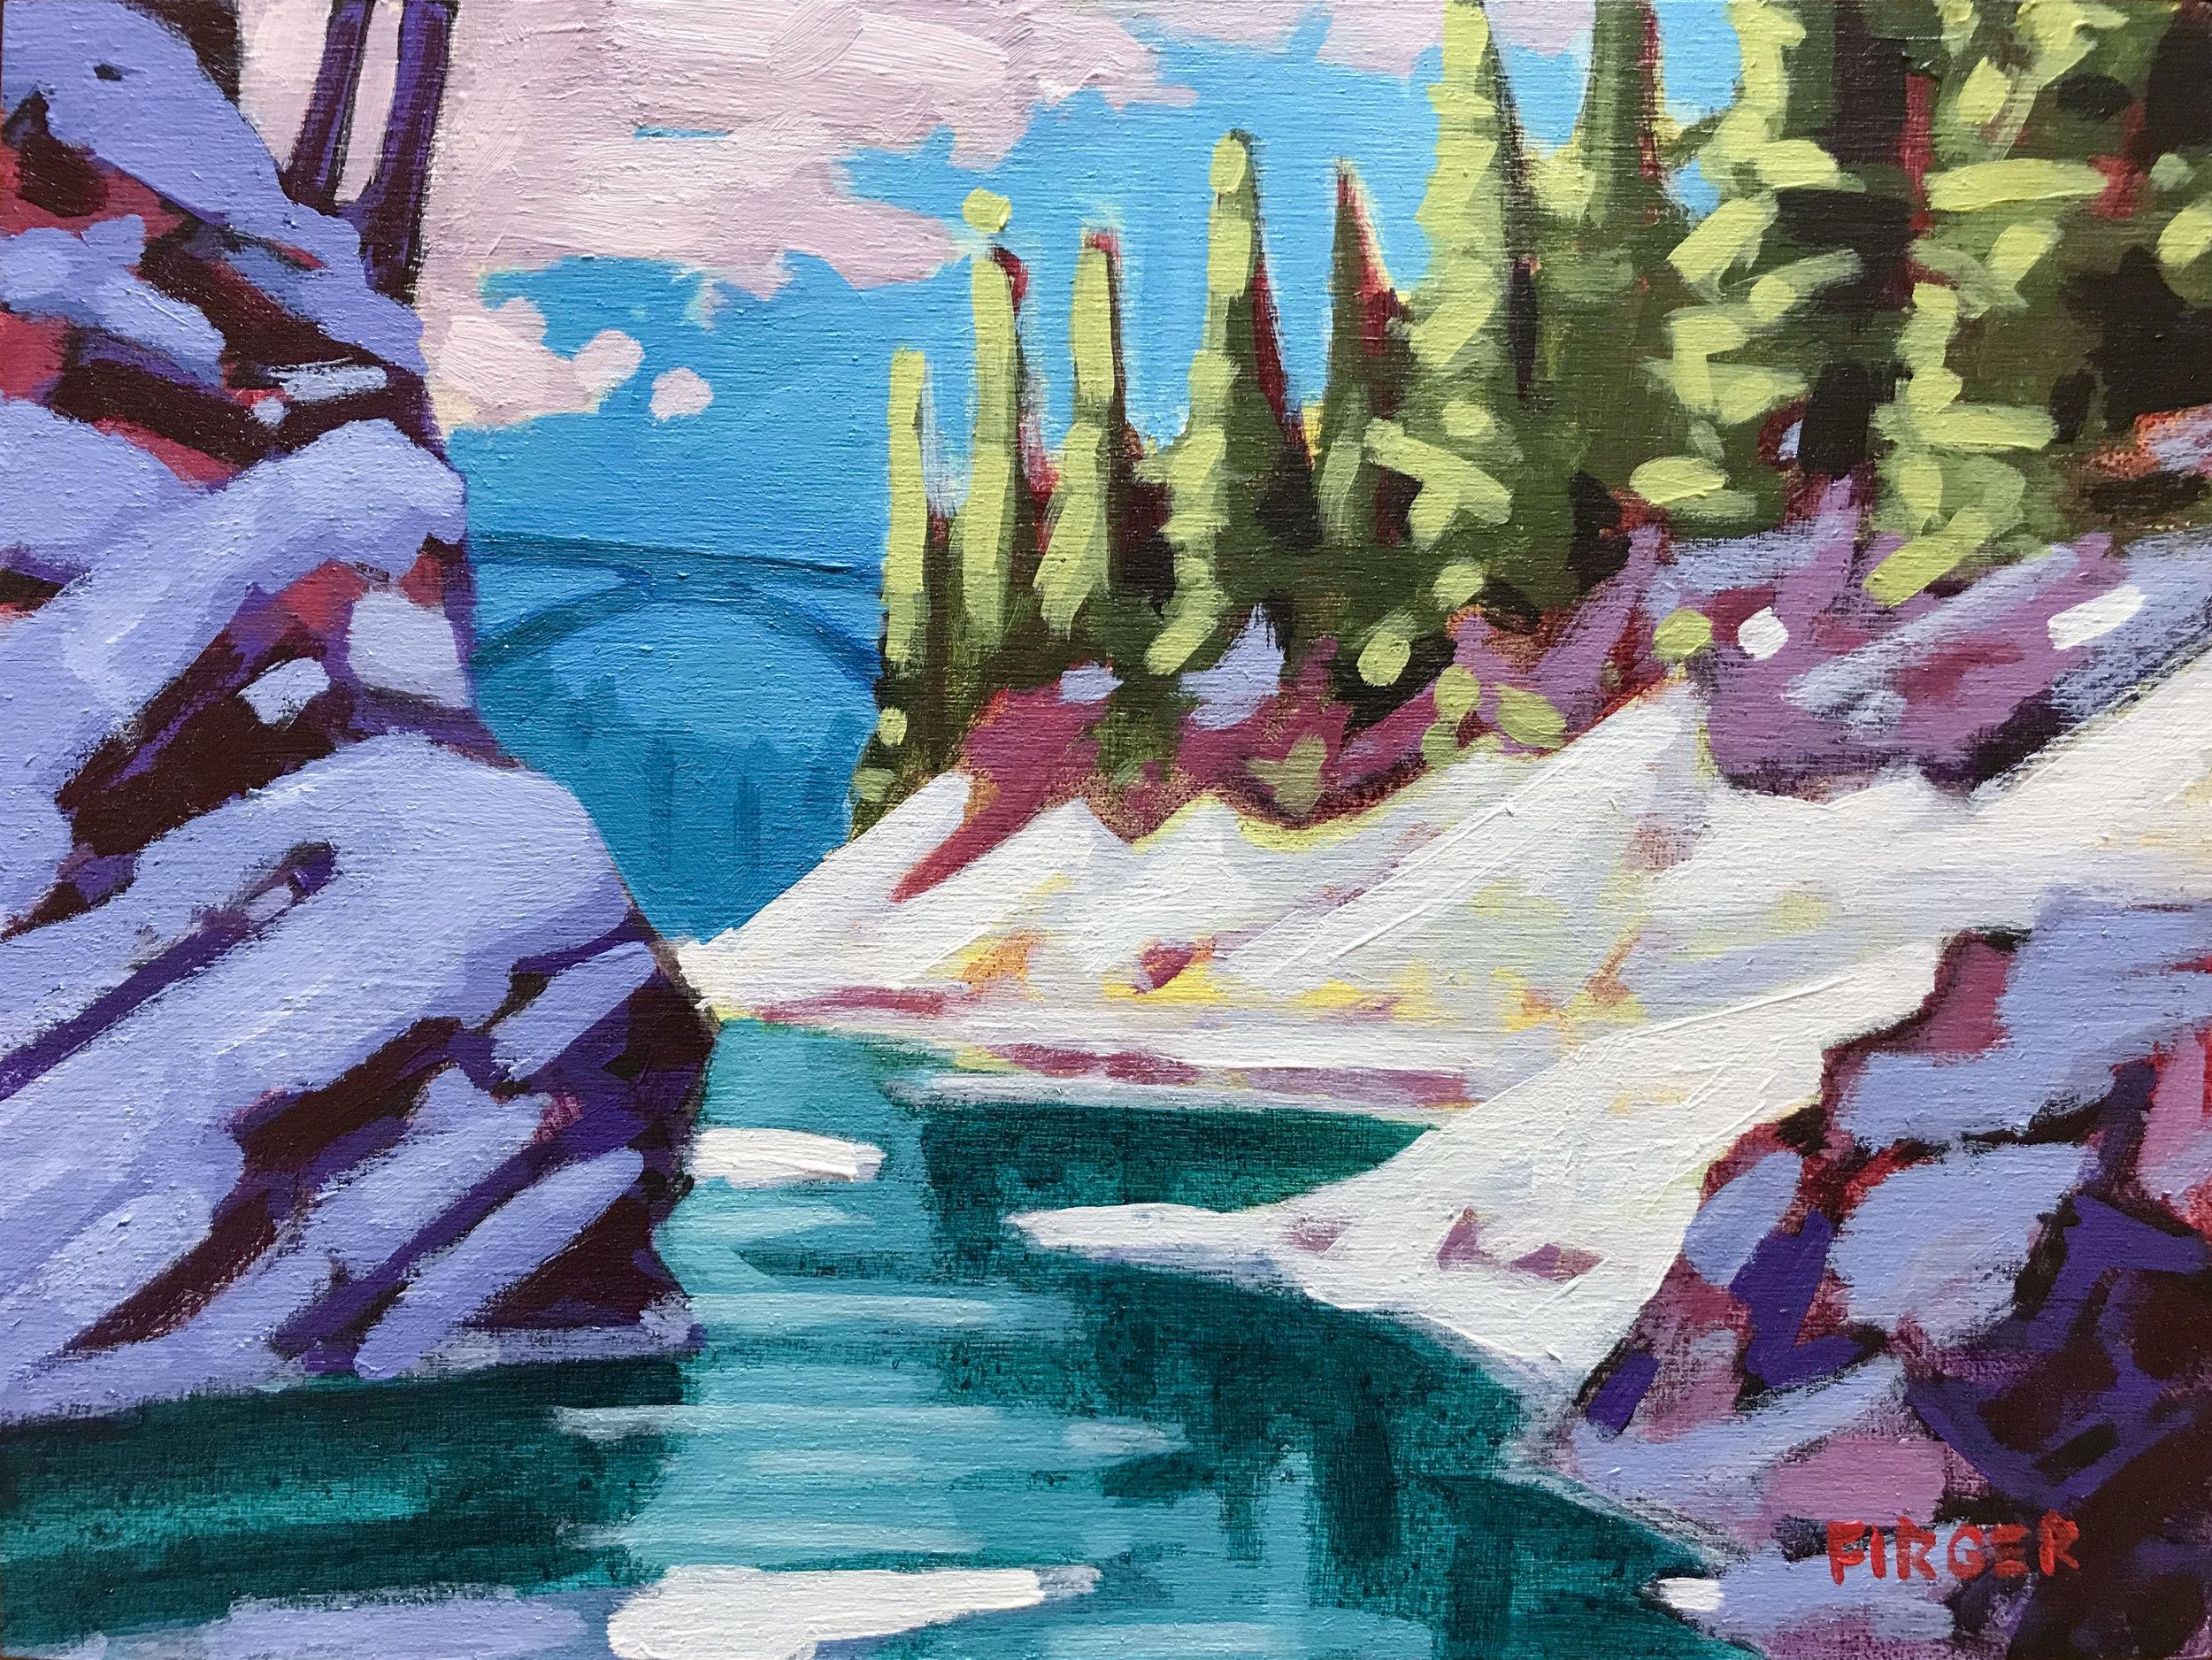 Quechee Gorge Thaw - 9 x 12, Acrylic on Panel